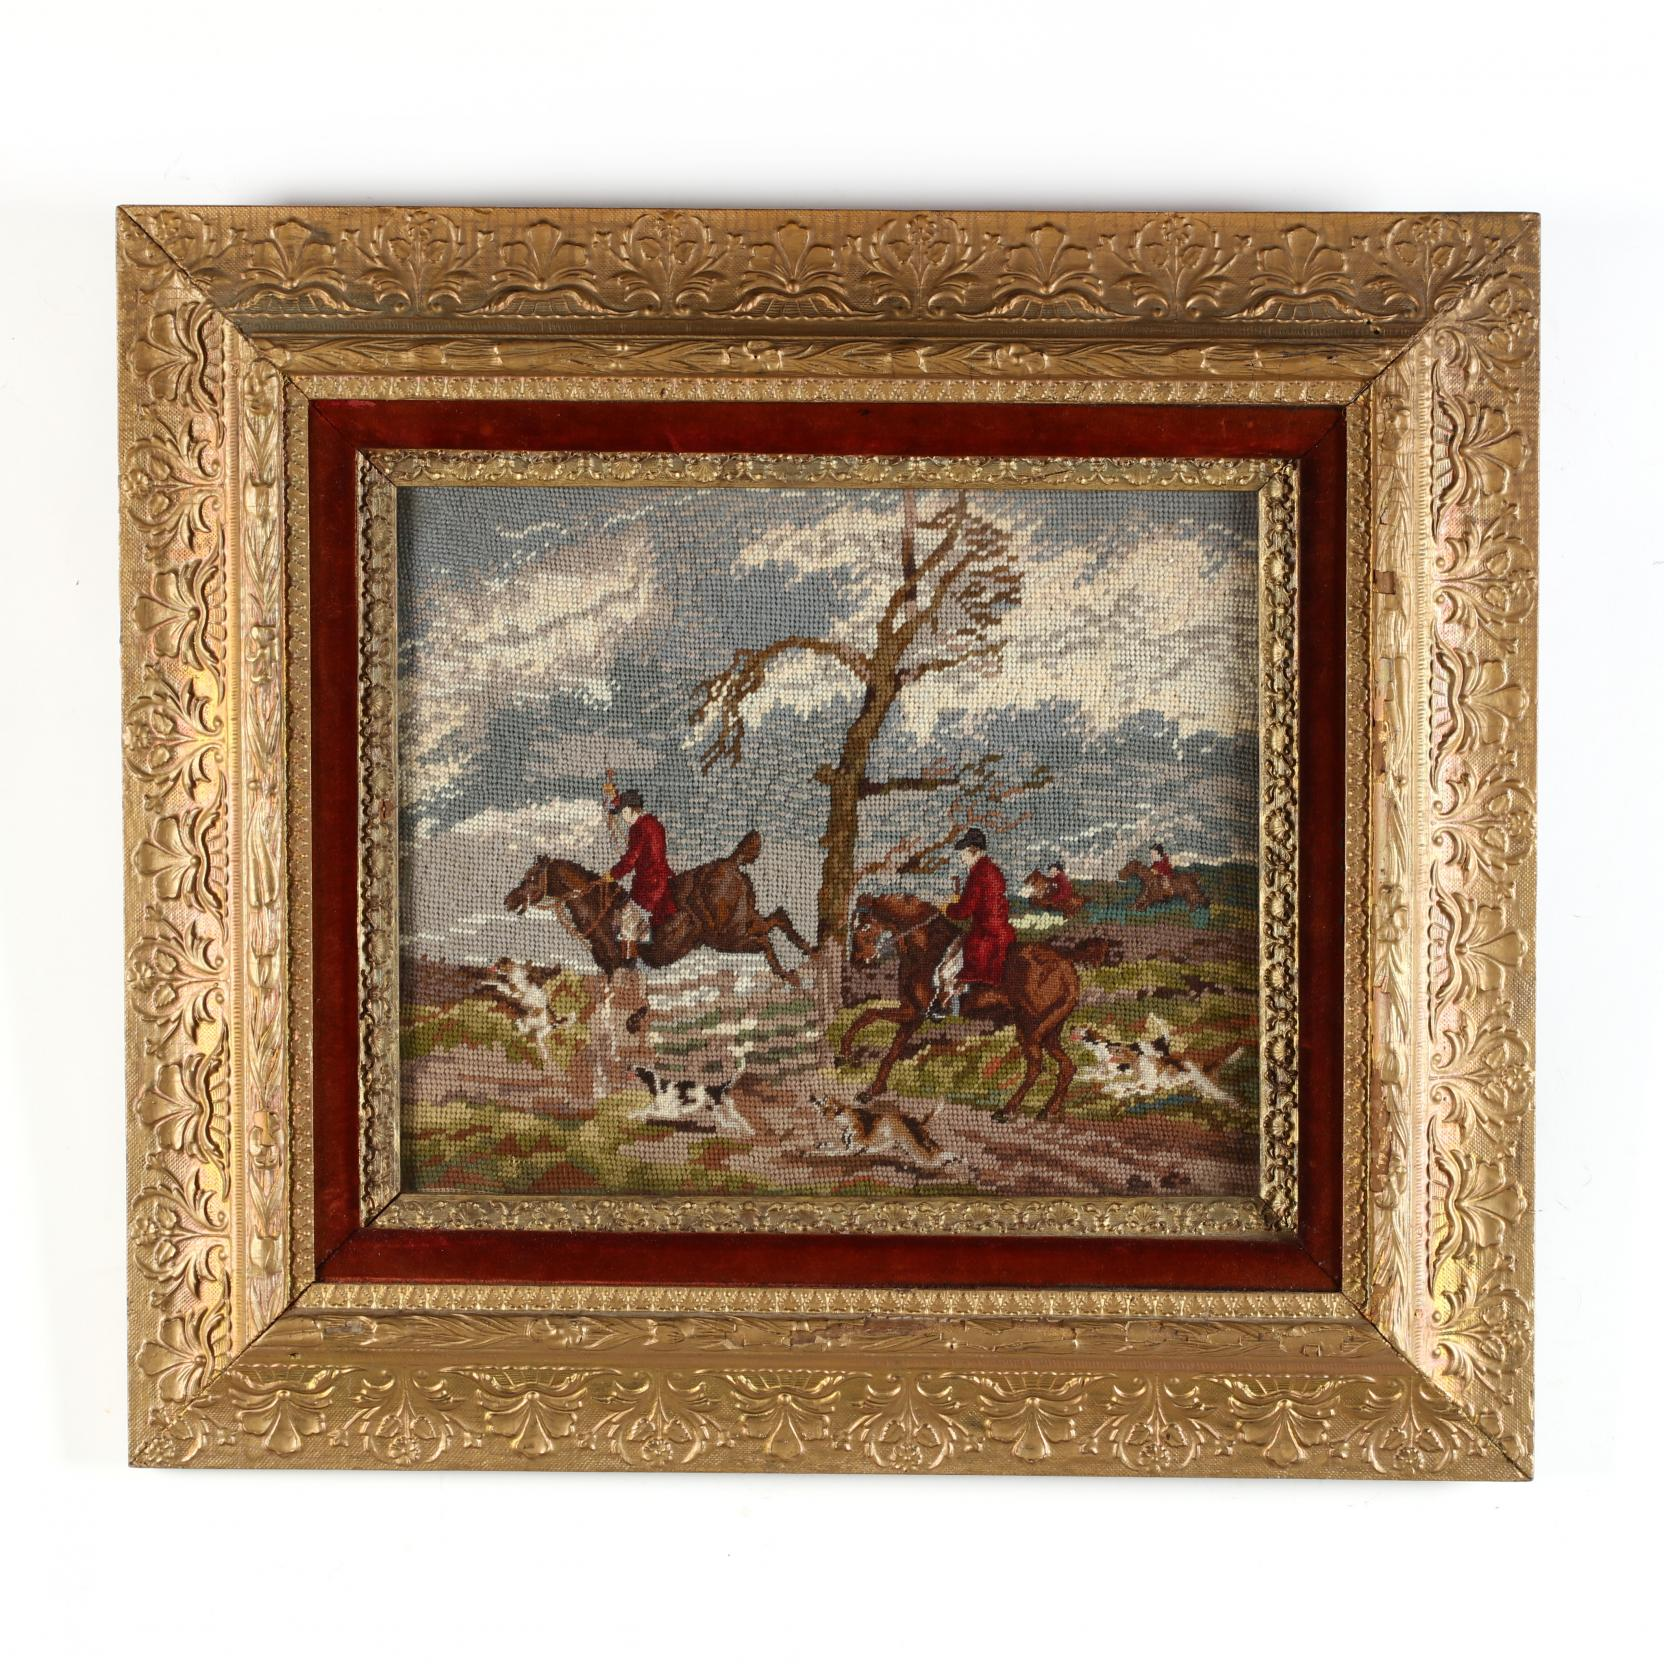 vintage-equestrian-theme-pictorial-needlework